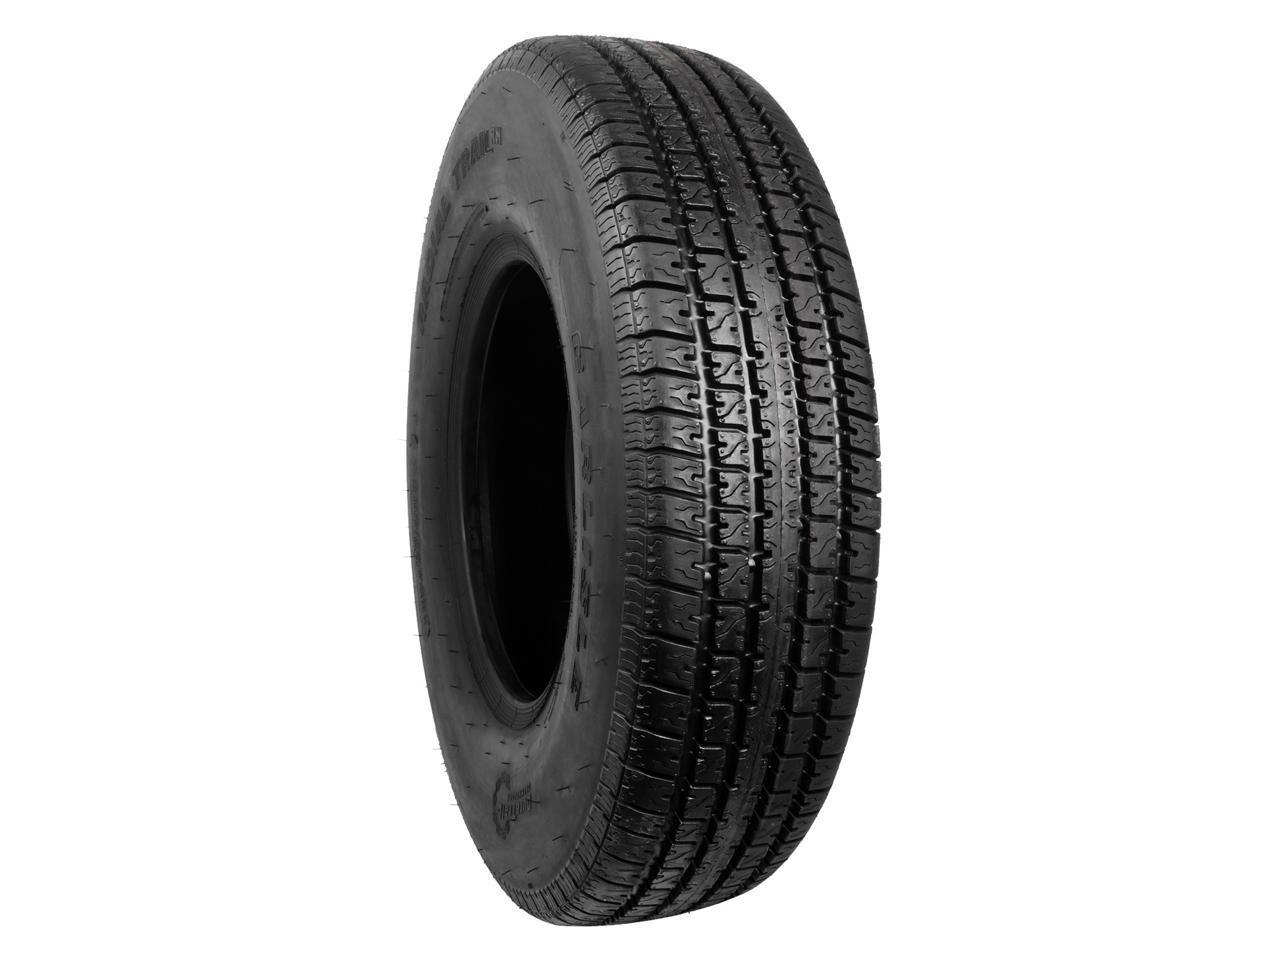 New Carlisle Radial Trail HD Trailer Tire Only ST225/75R15 225 75 15 10PR LRE - Newegg.com